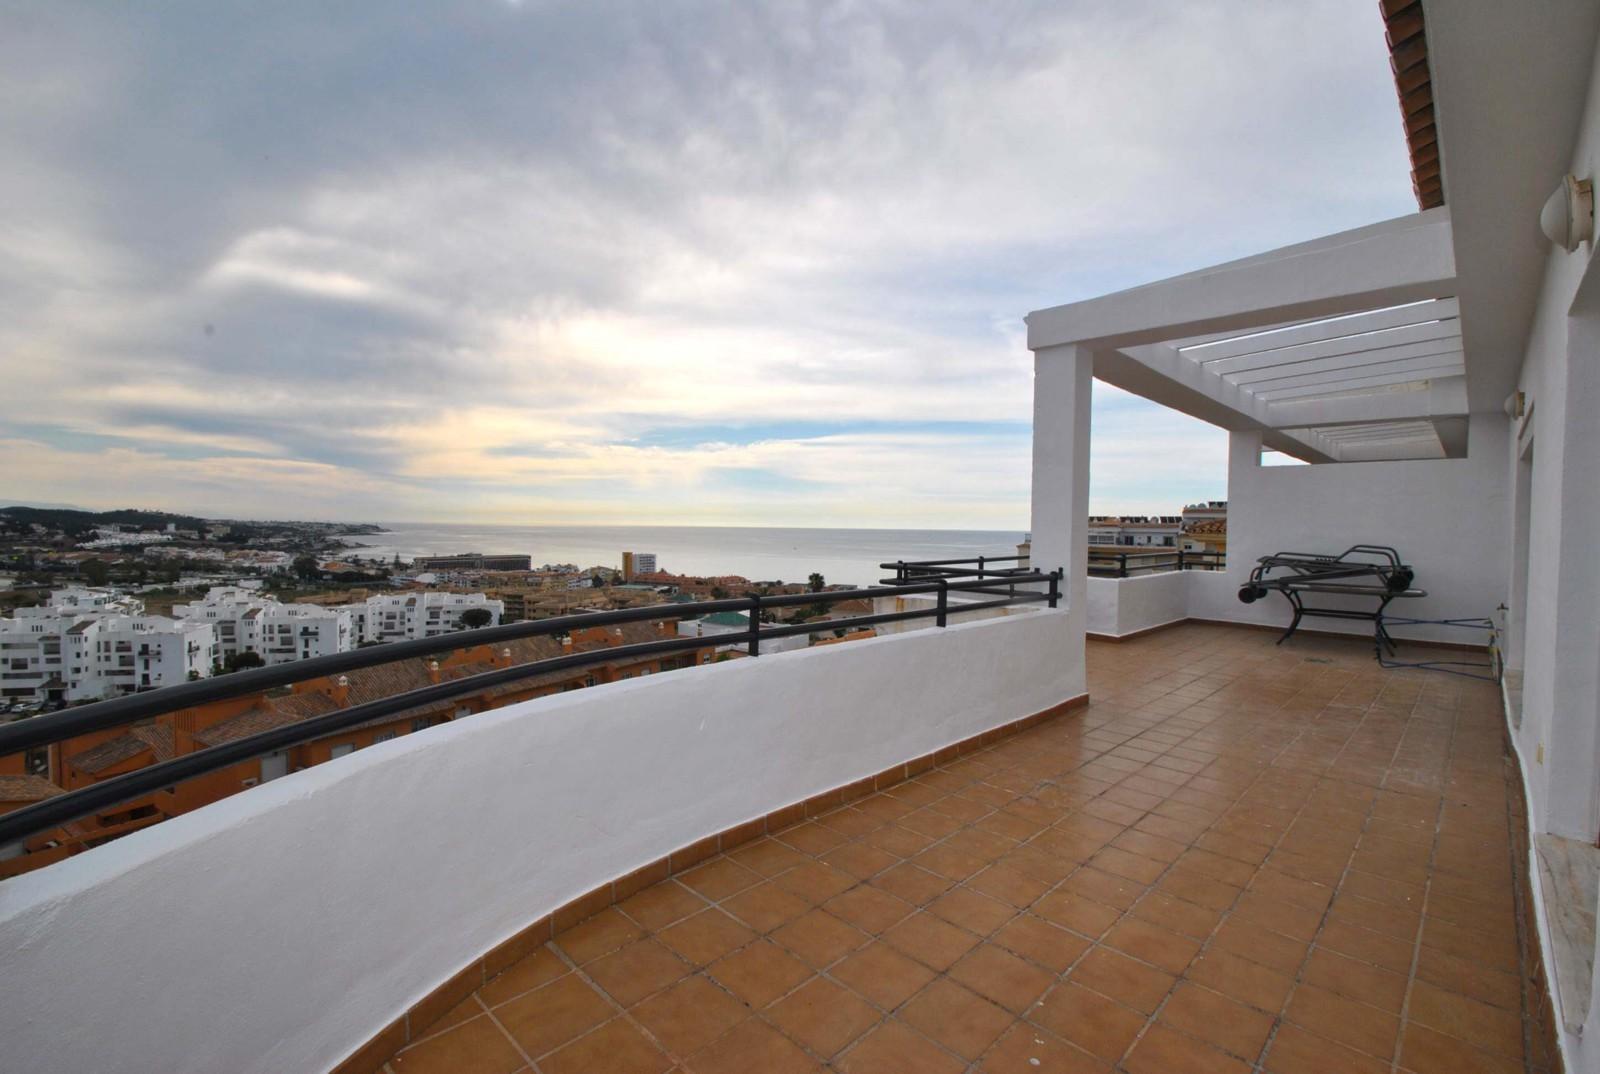 2 Bed Apartment in La Cala de Mijas